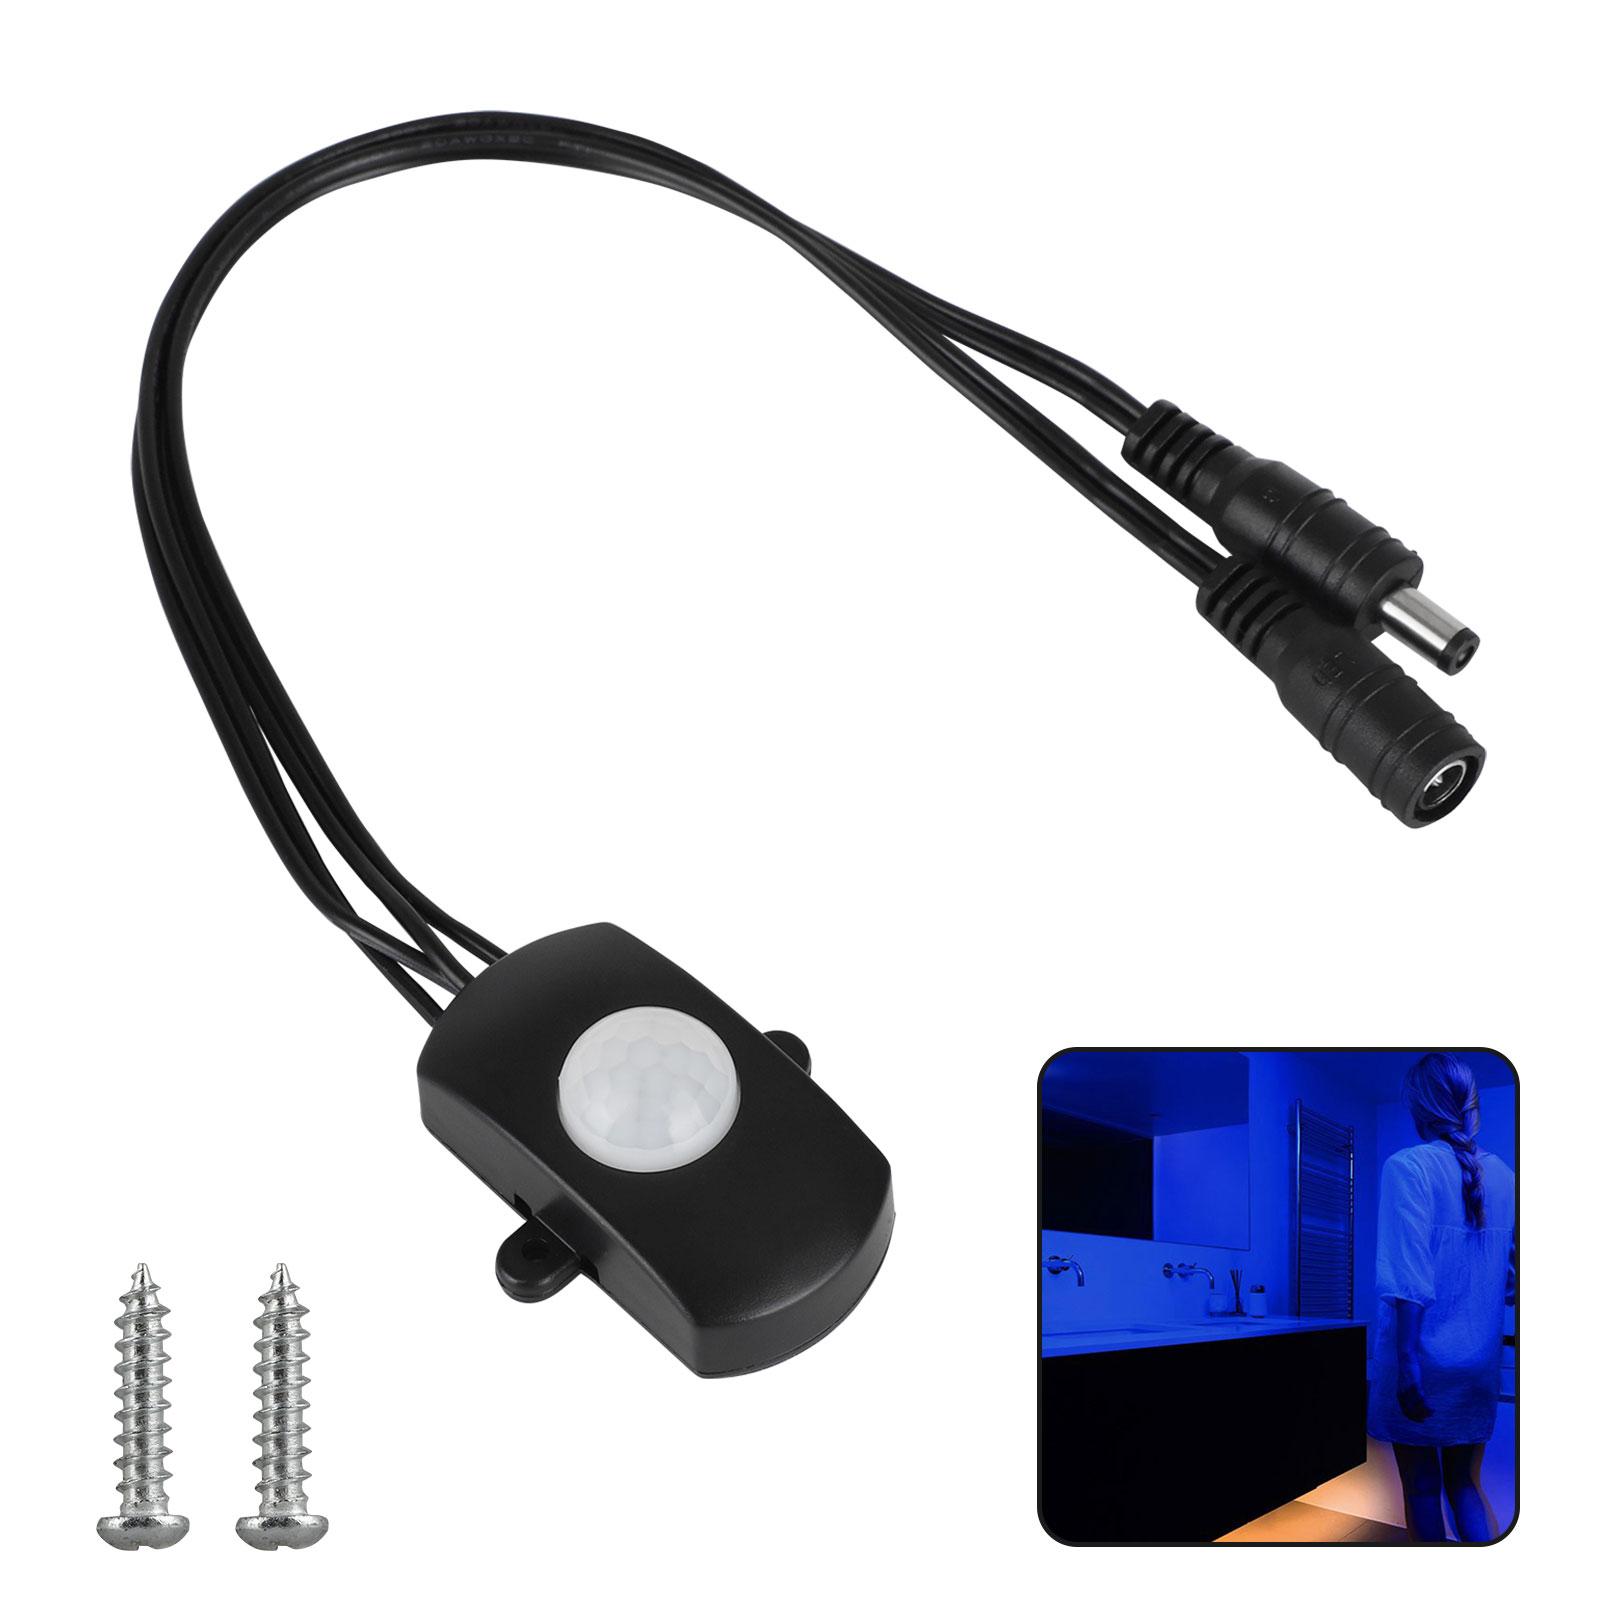 Eeekit Dc 12v To 24v Mini Pir Motion Sensor Switch